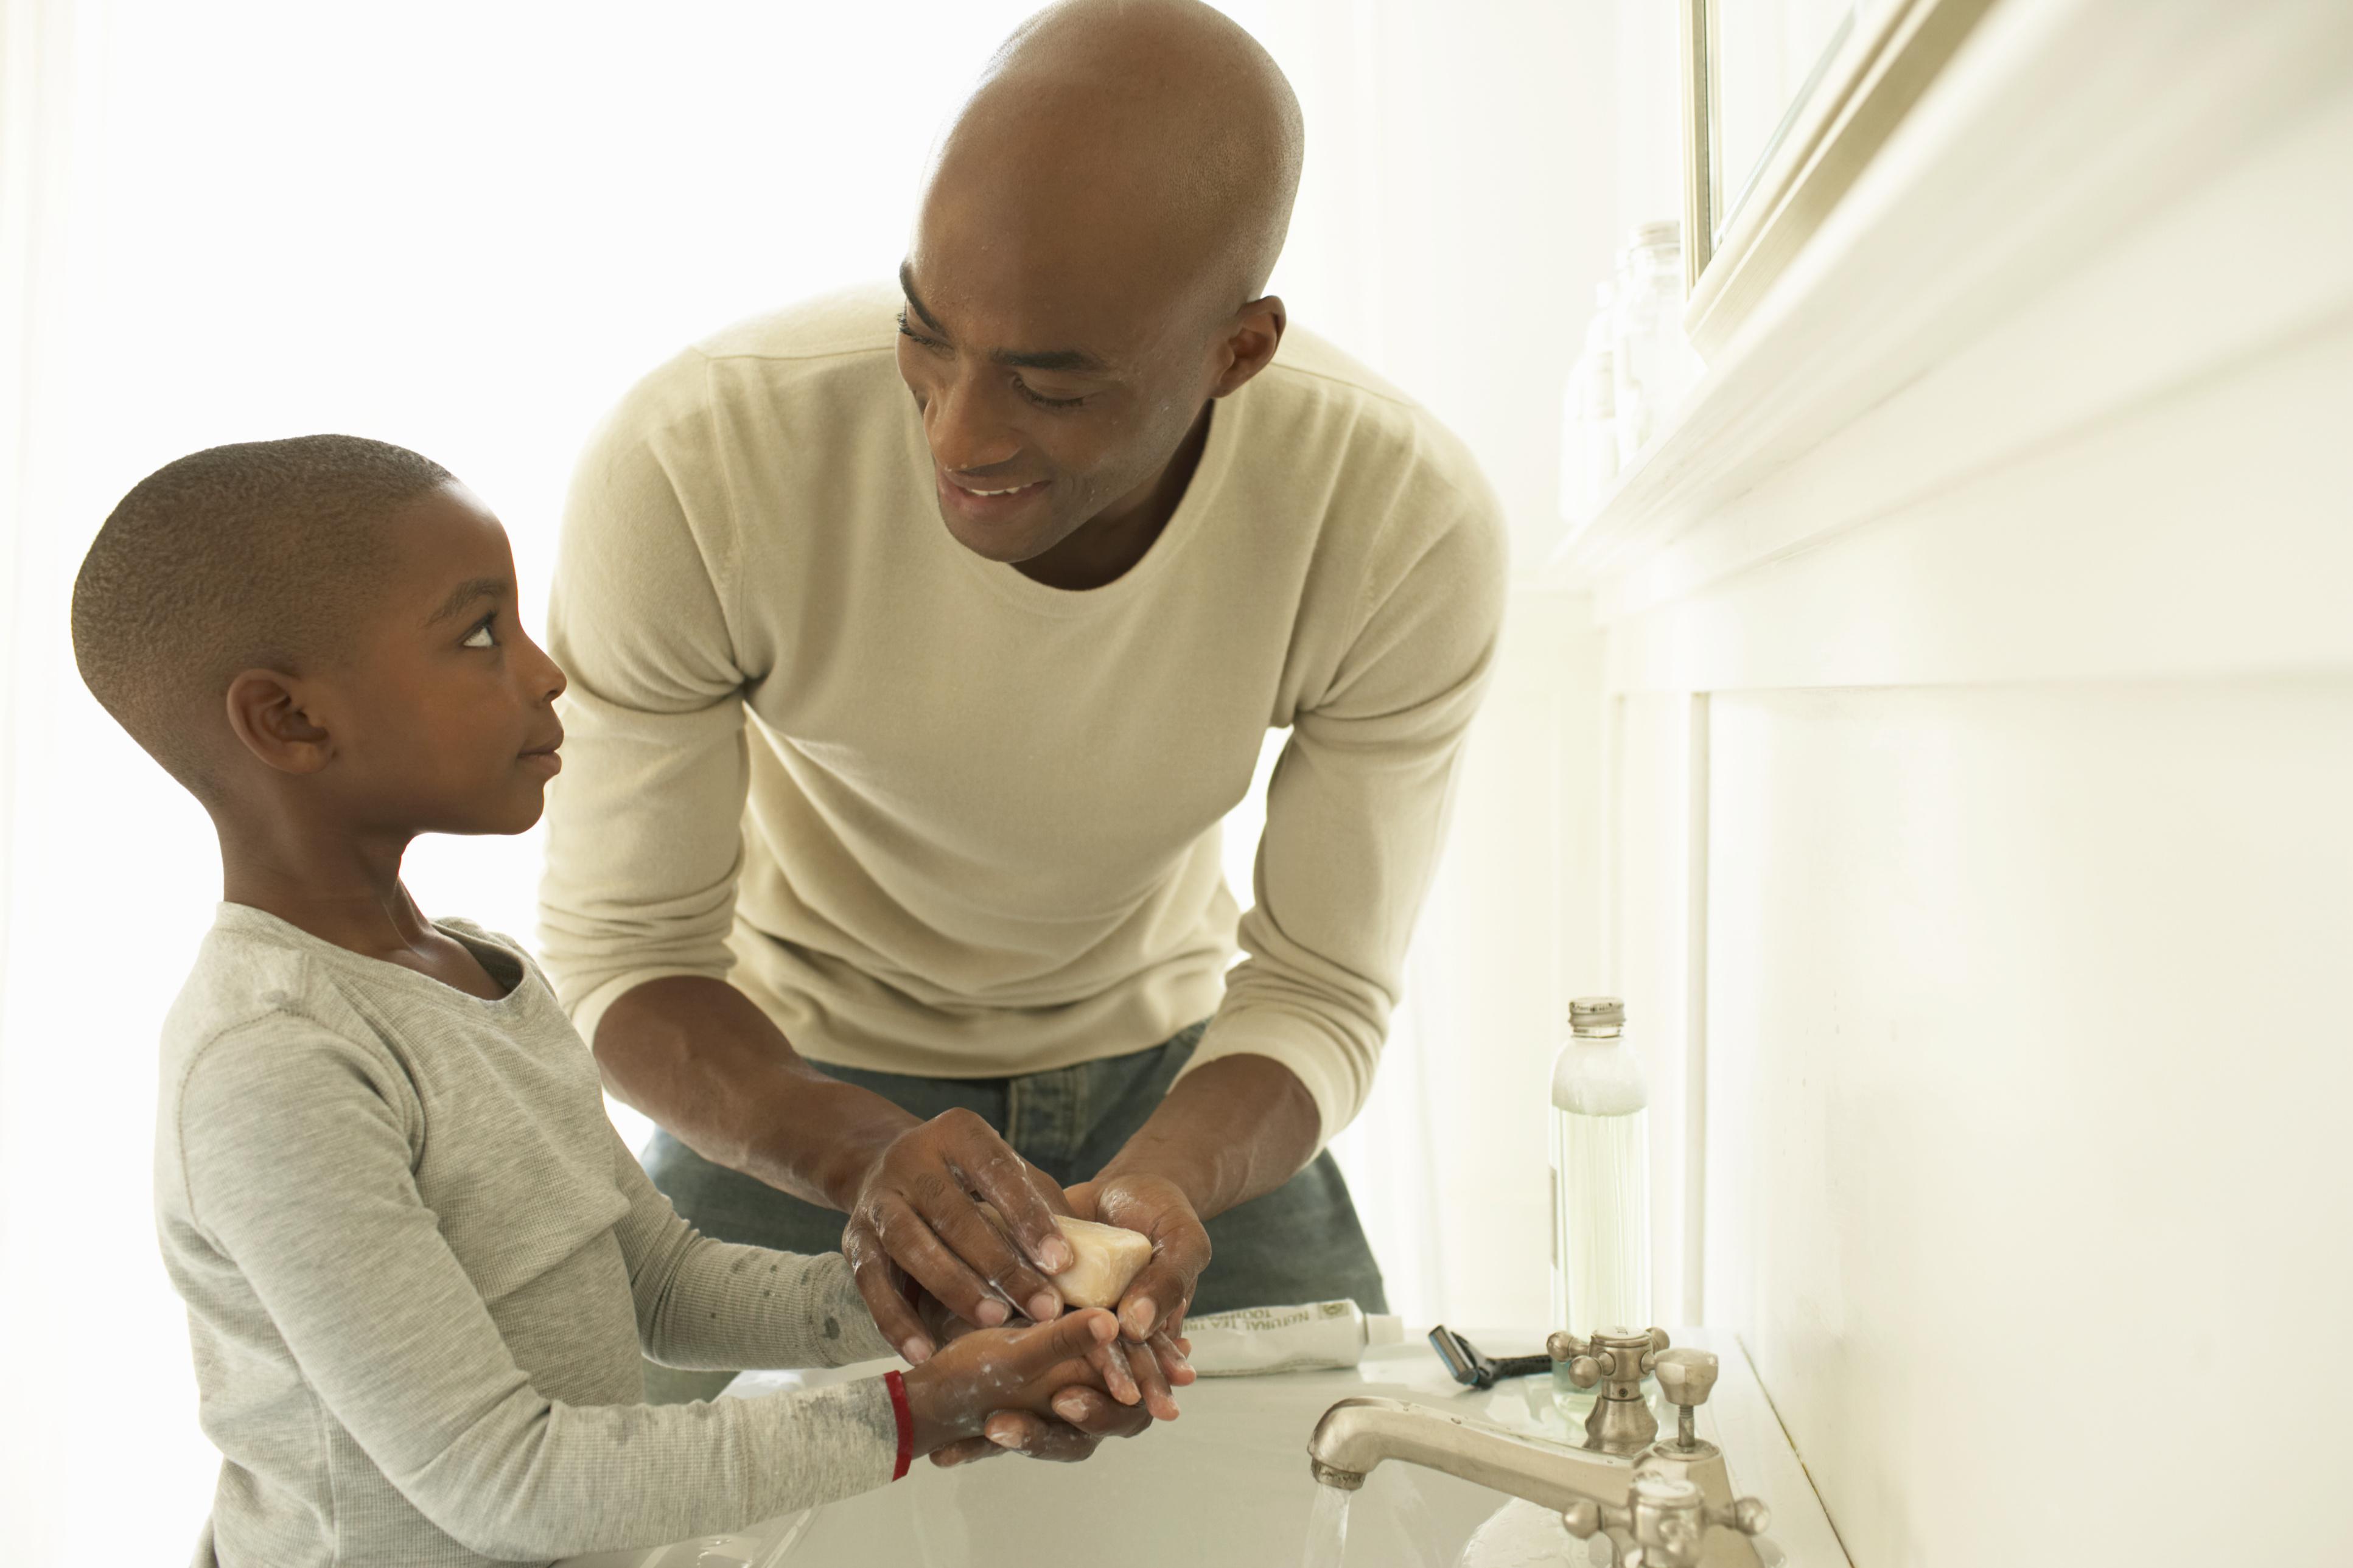 man and boy washing hands